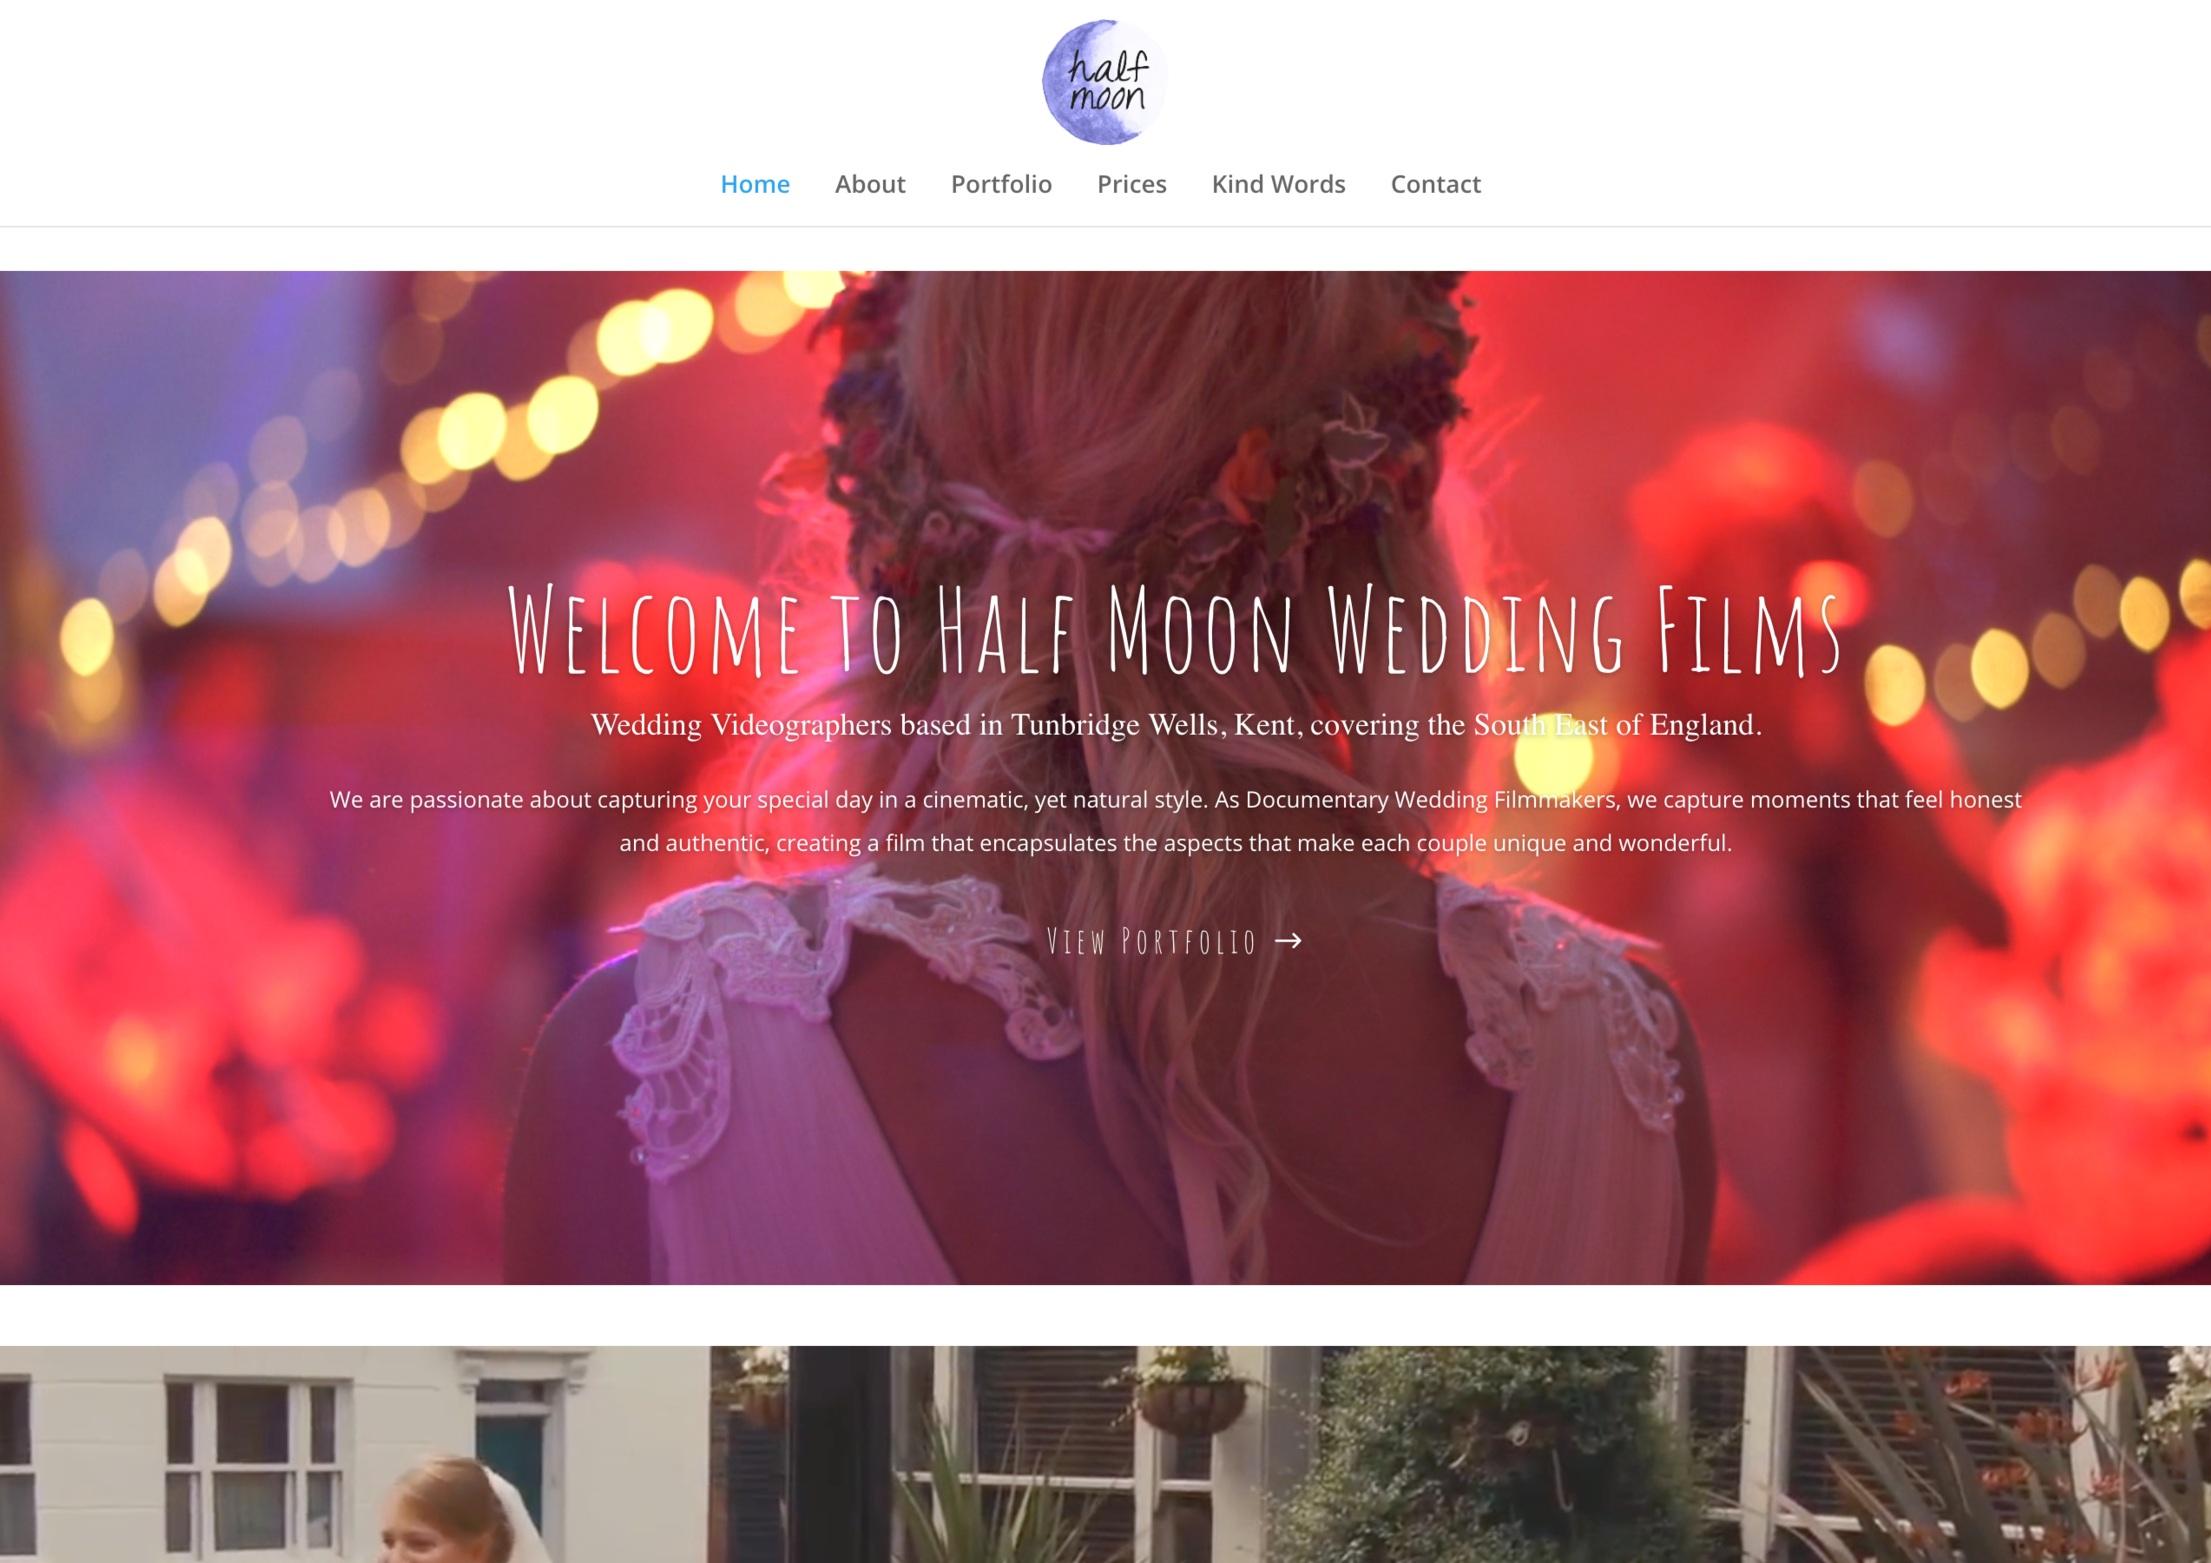 Rosehip+Website+Design+-+Portfolio+-+Half+Moon+Wedding+Films